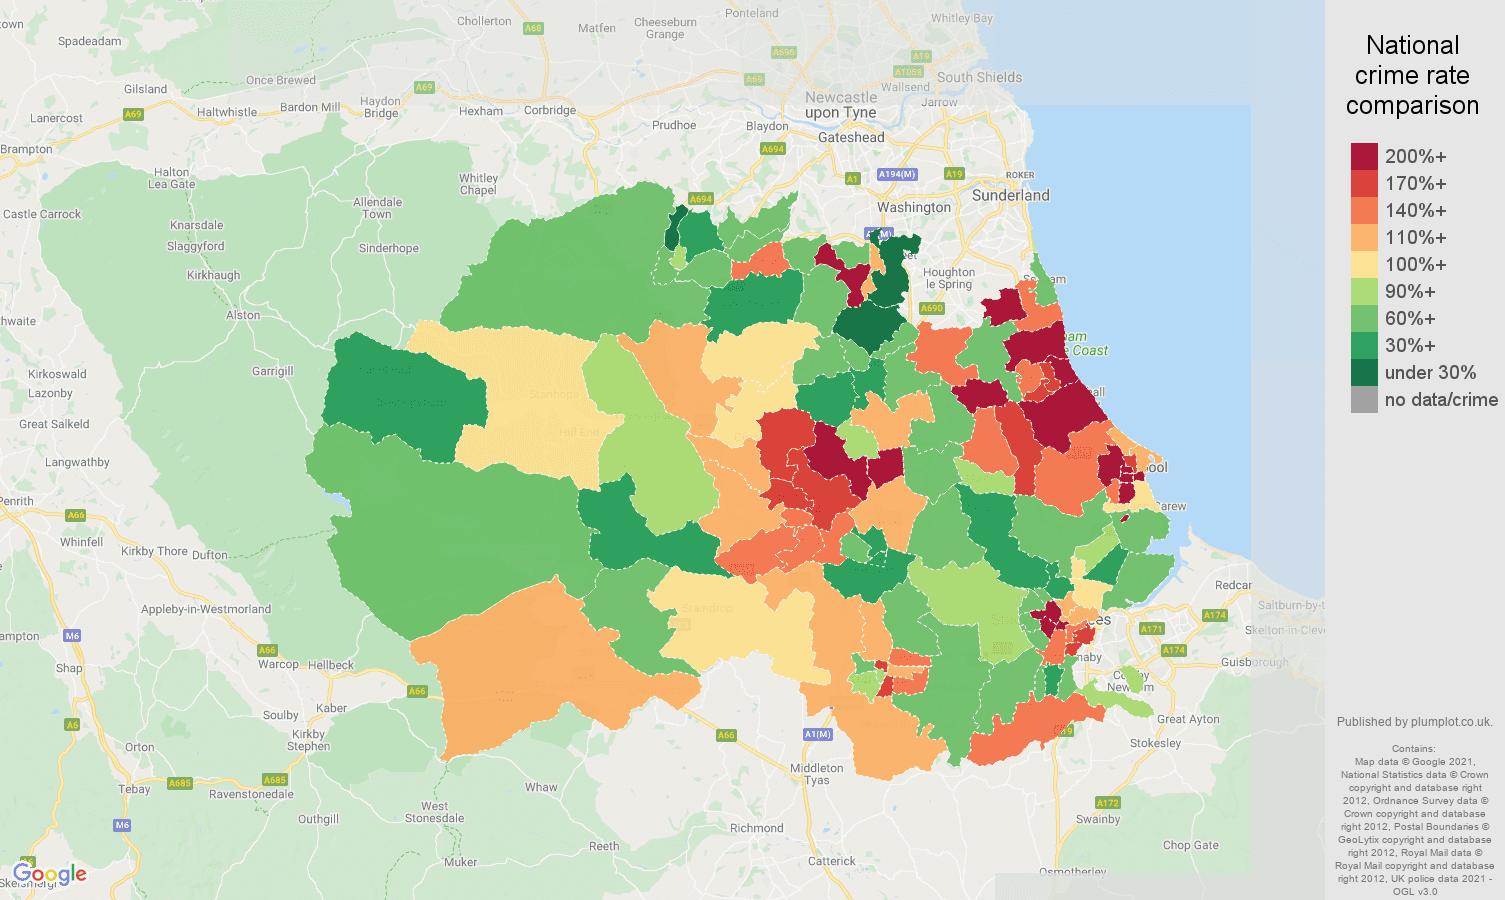 Durham county burglary crime rate comparison map